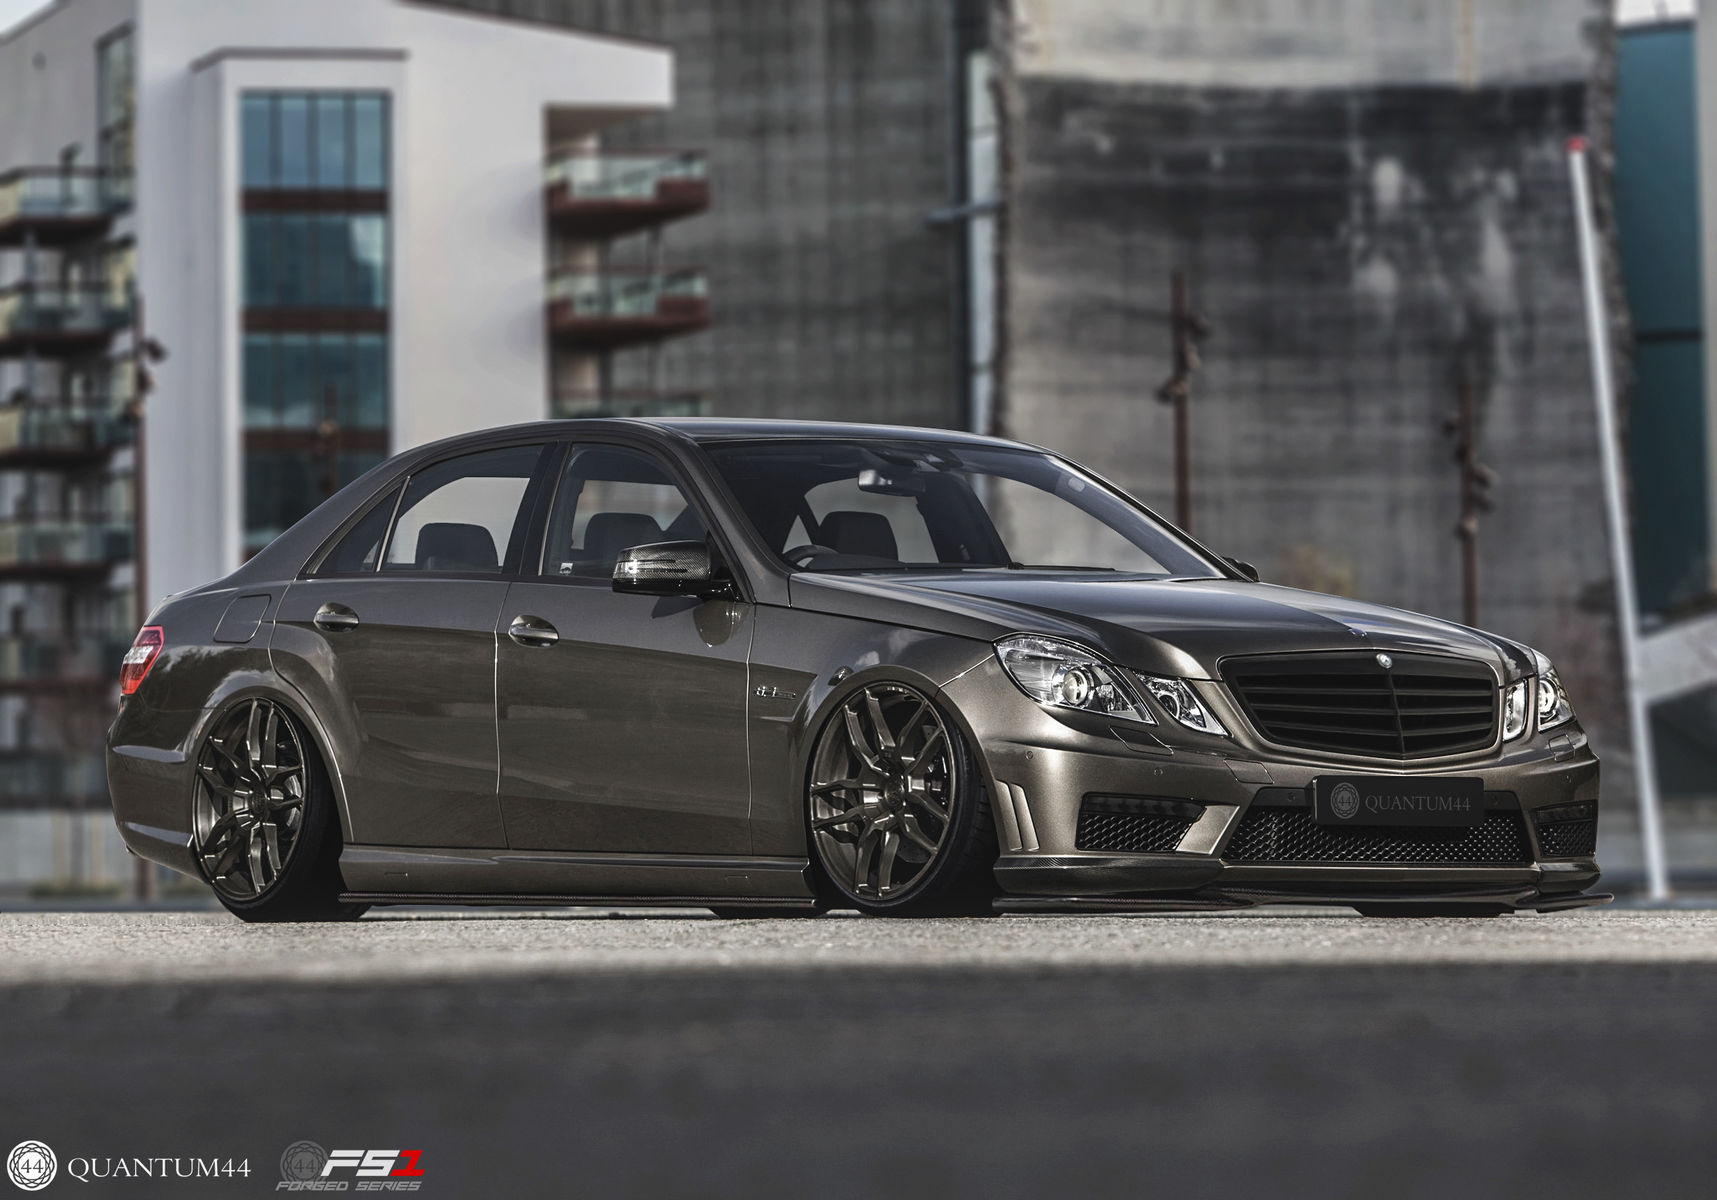 Mercedes-Benz E63 AMG | Quantum44 FS1 Forged Wheels - Mercedes Benz E63 AMG